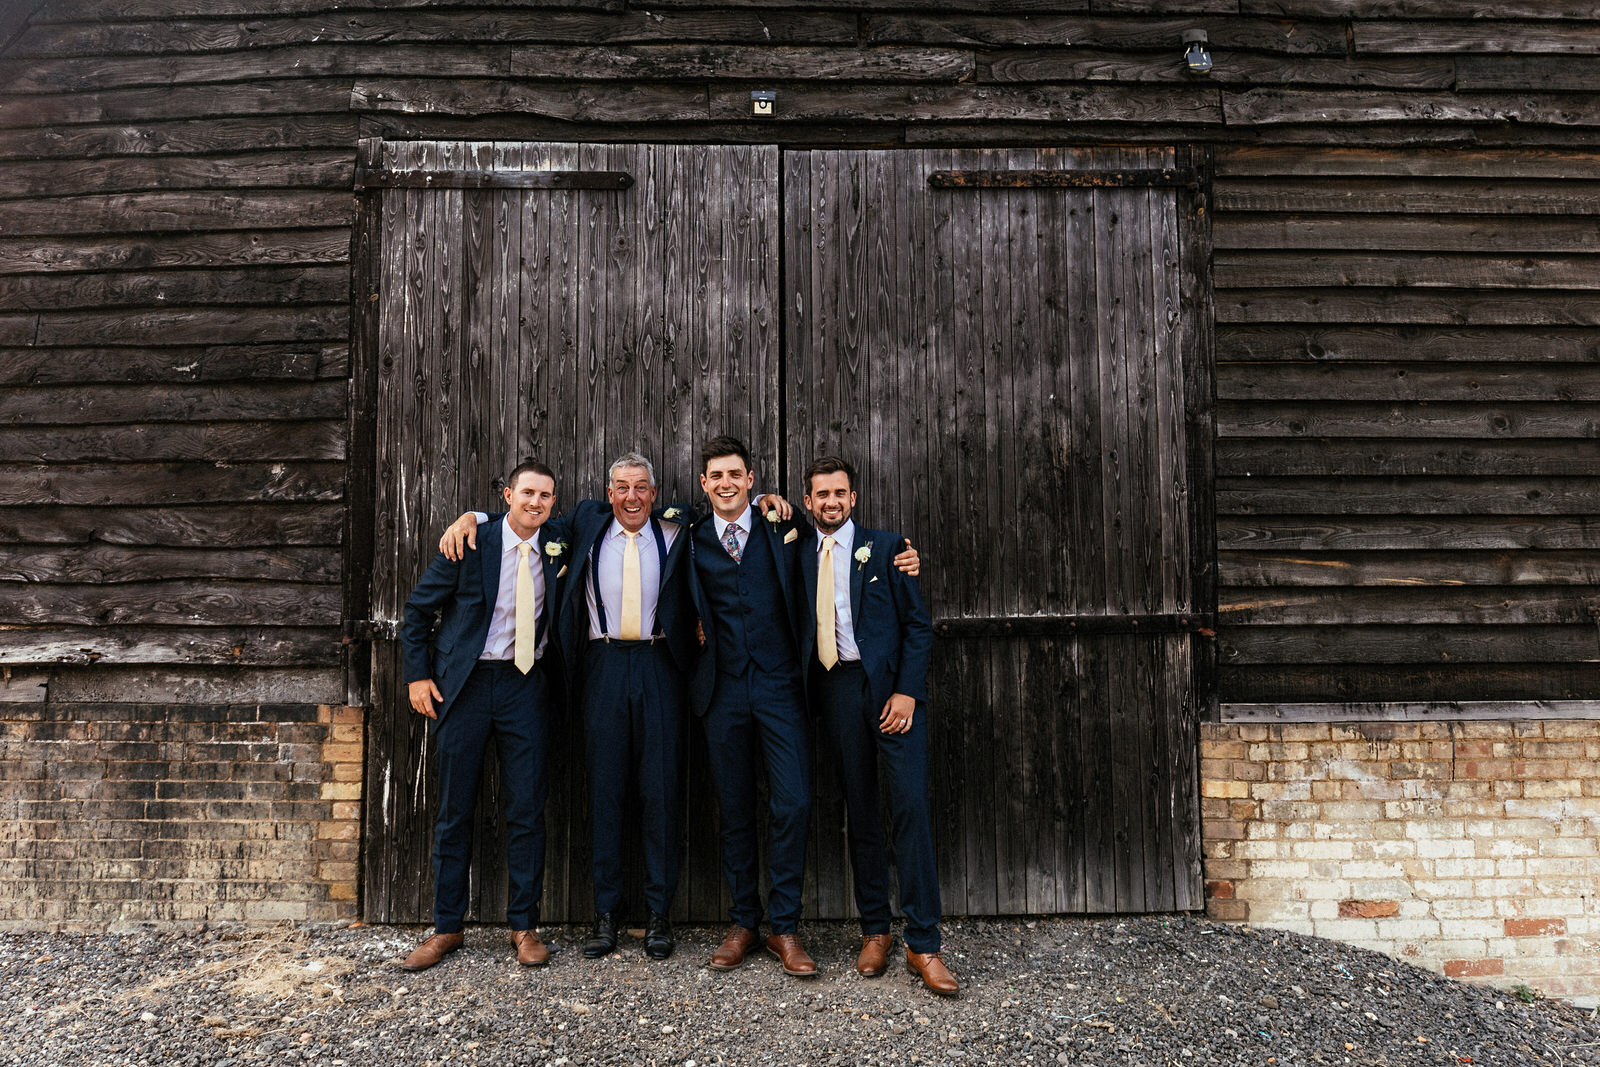 Edworth-Manor-Farm-Wedding-Photographer-046.jpg